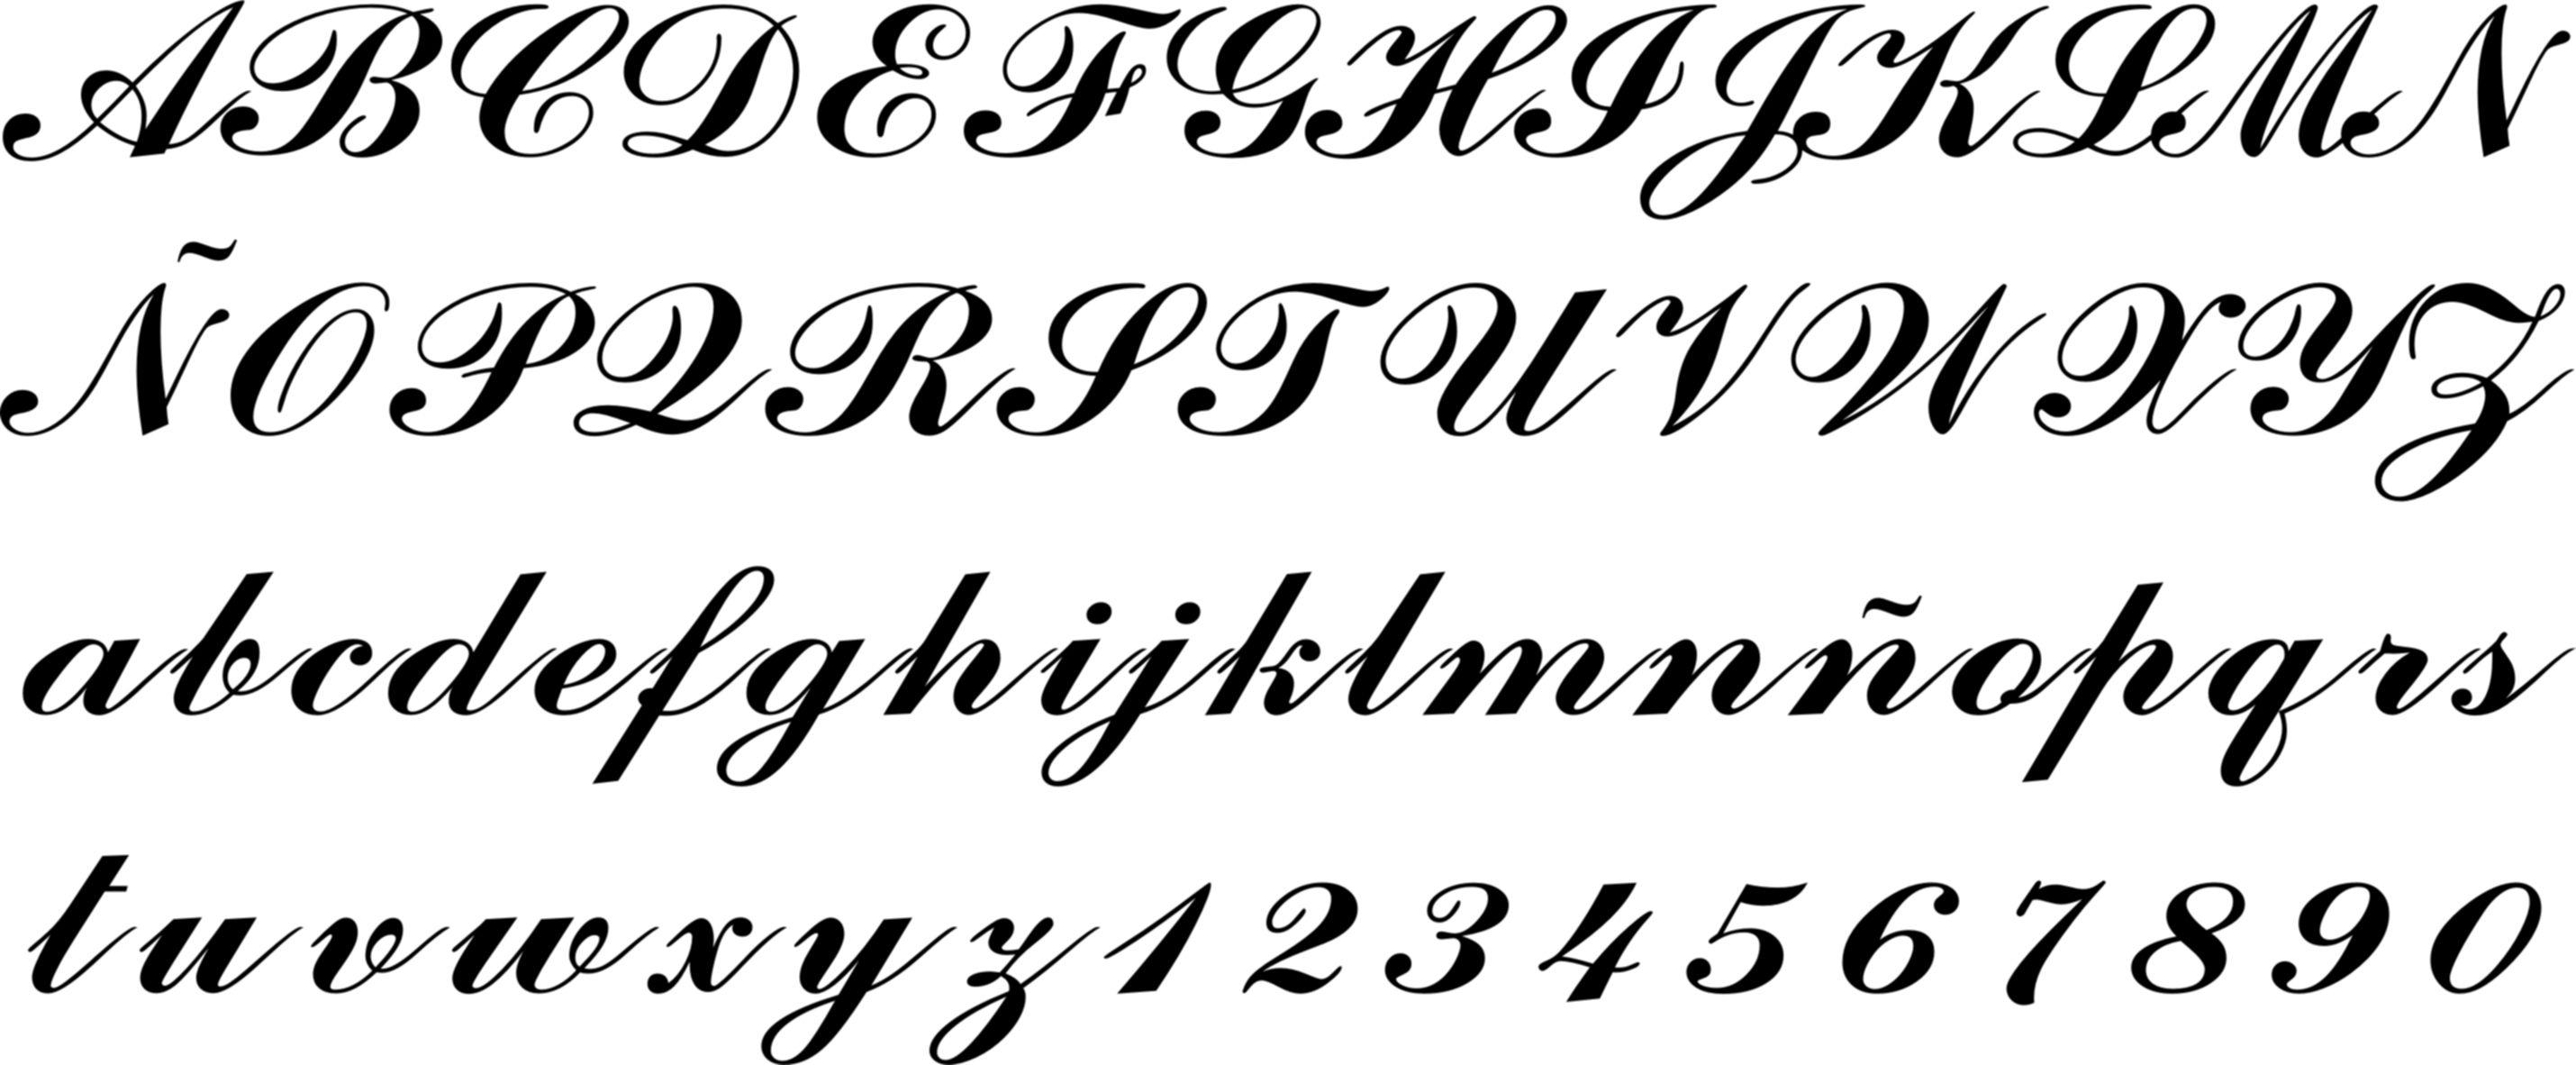 Misdibujosfavoritos Com Moldes De Letras Cursiva Tipos De Letras Letras Goticas Cursivas